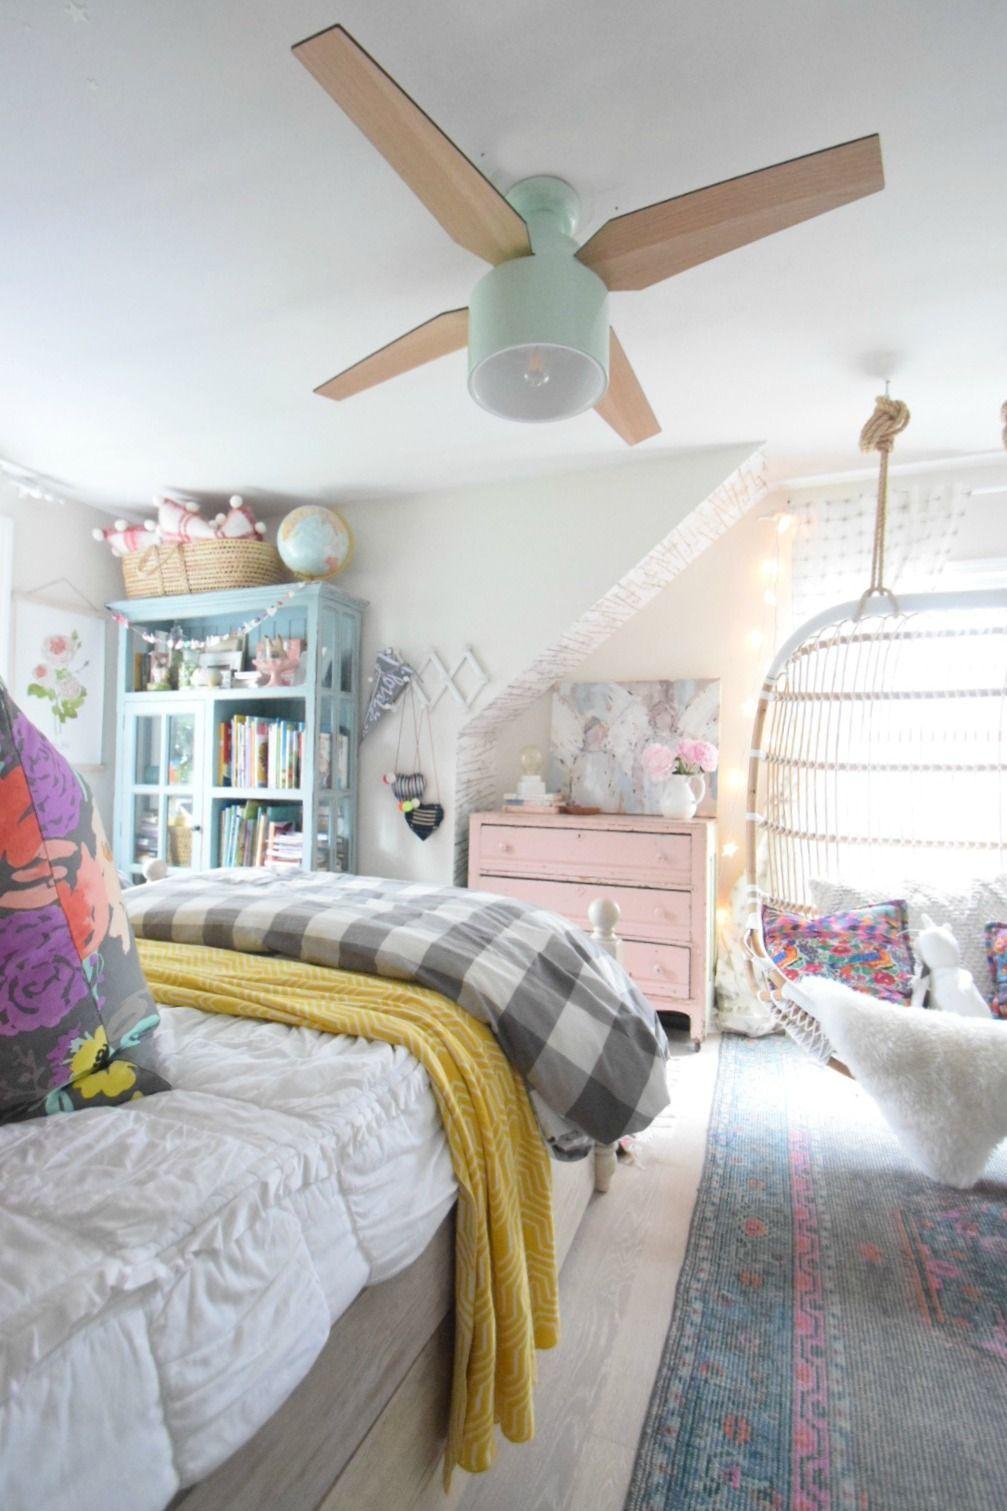 Tween Designed Bedroom Modern And Stylish Ceiling Fans Bedroom